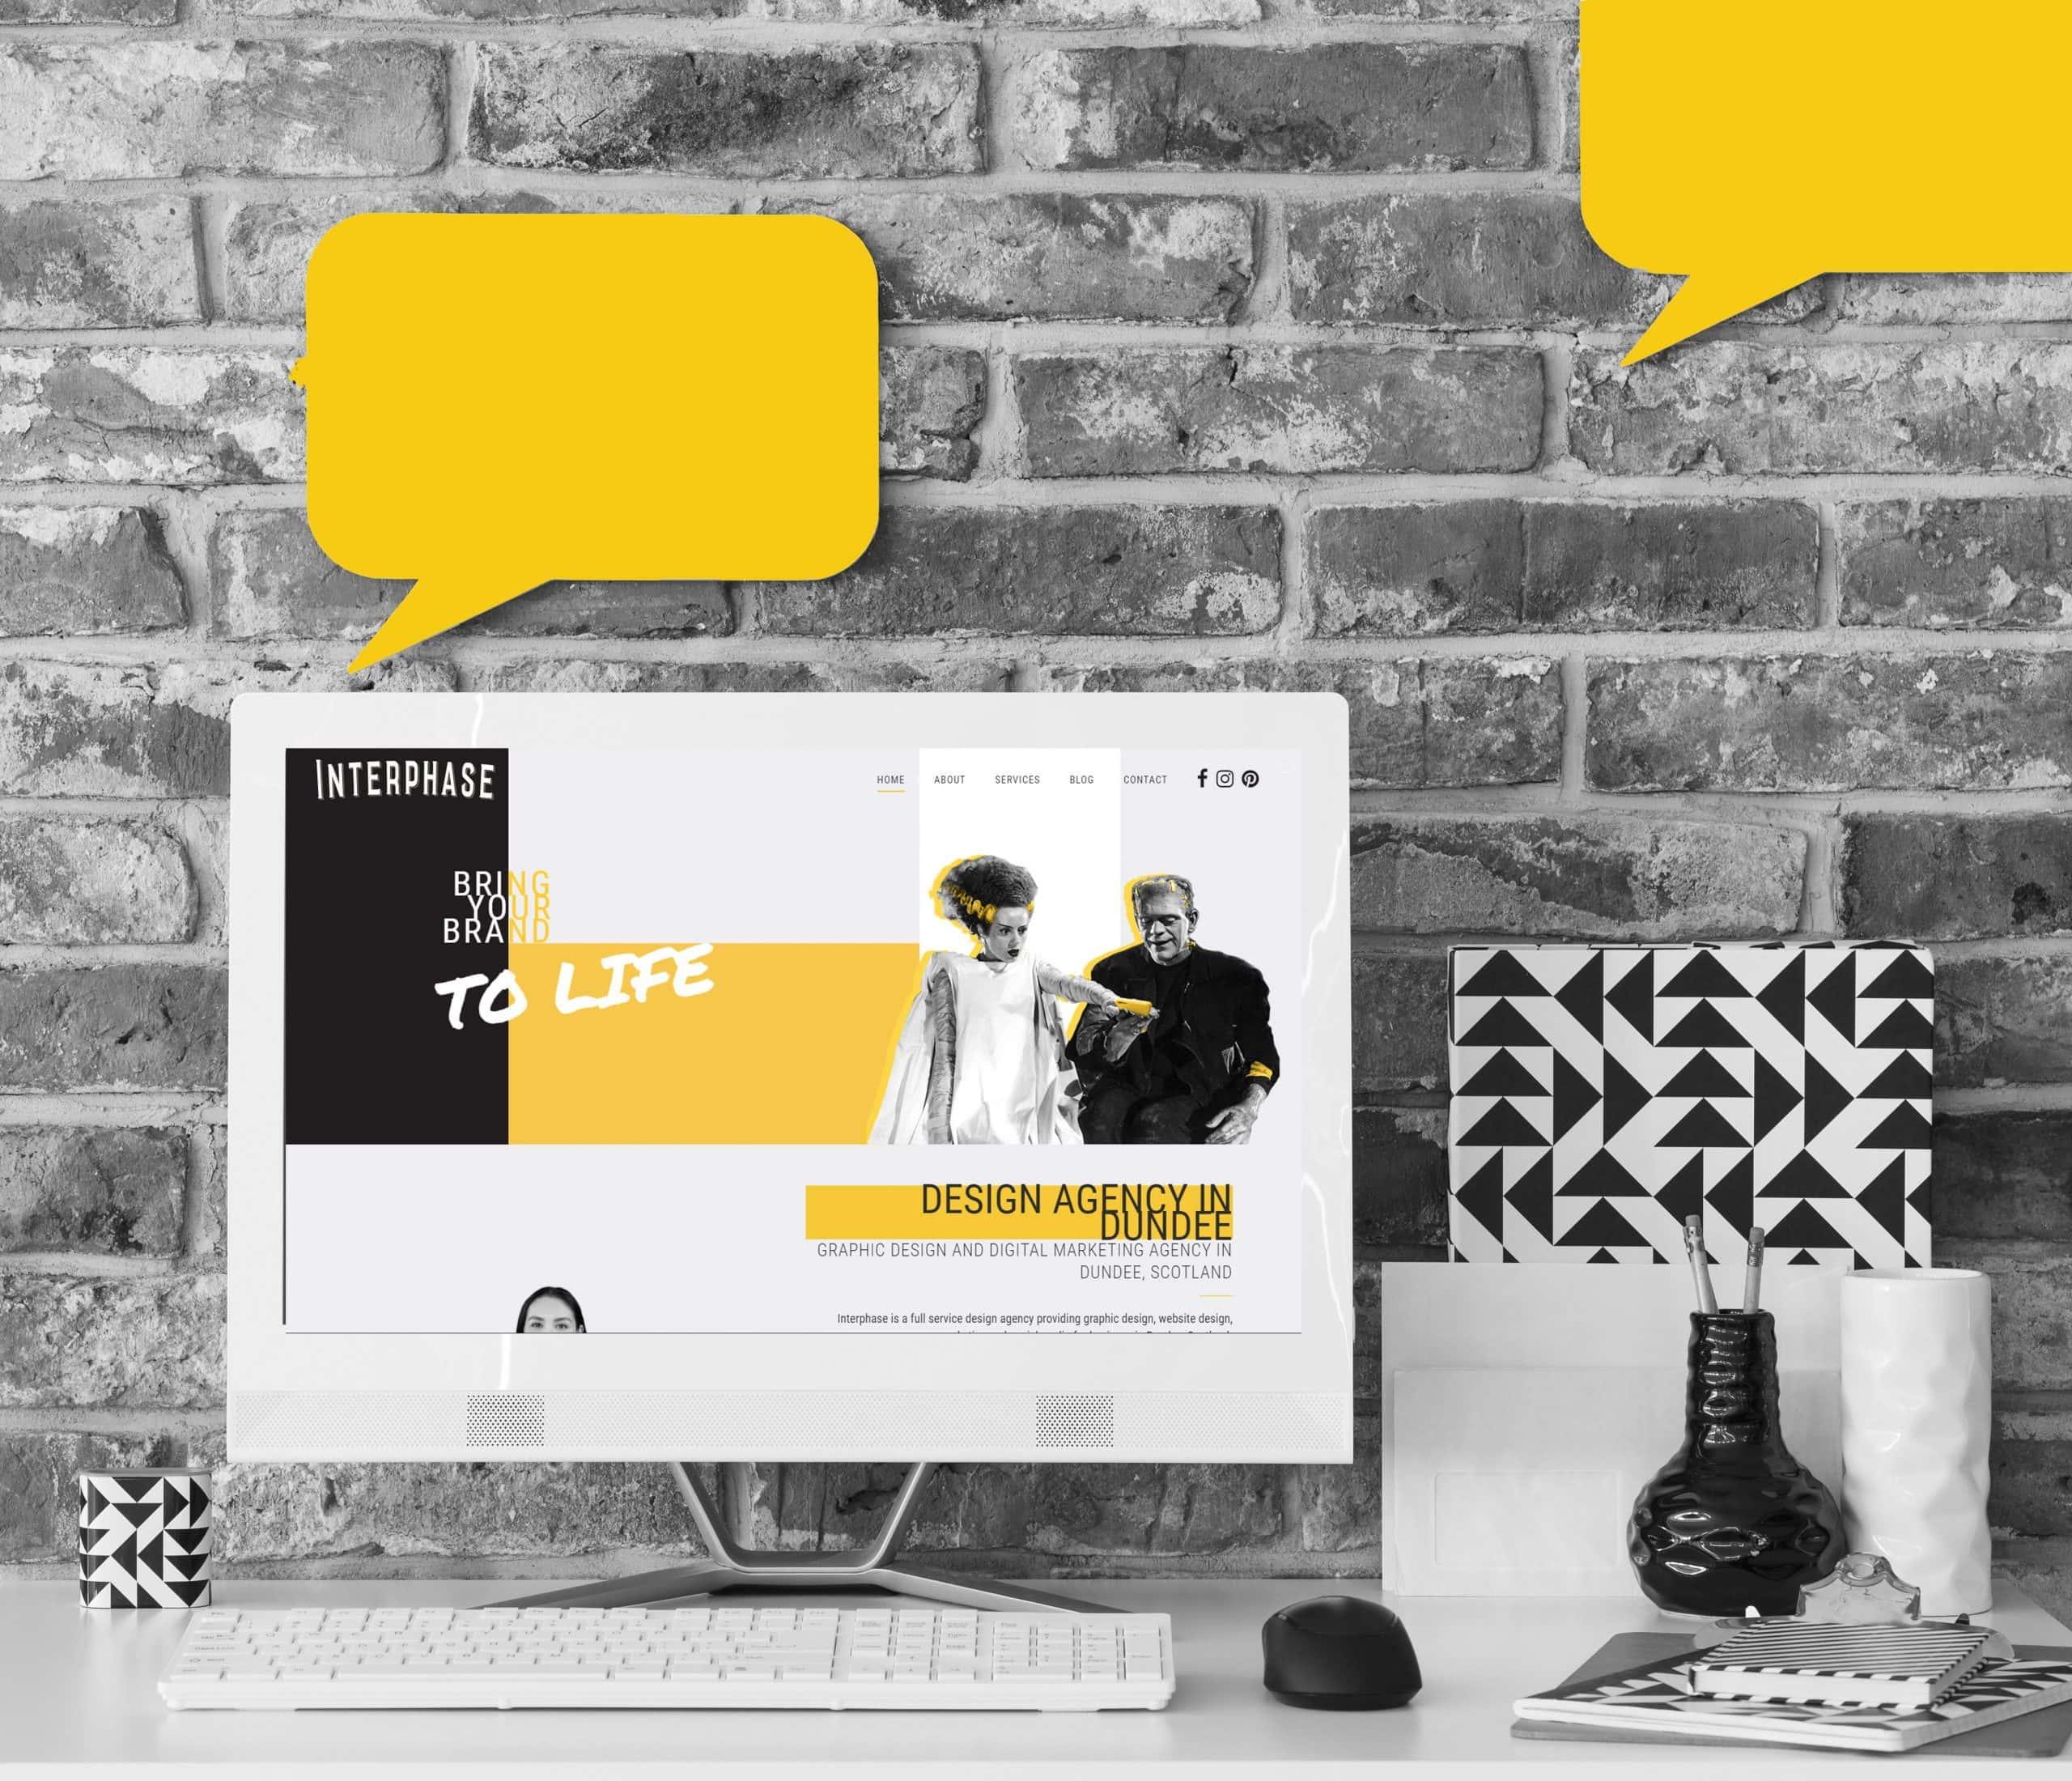 dundee website design